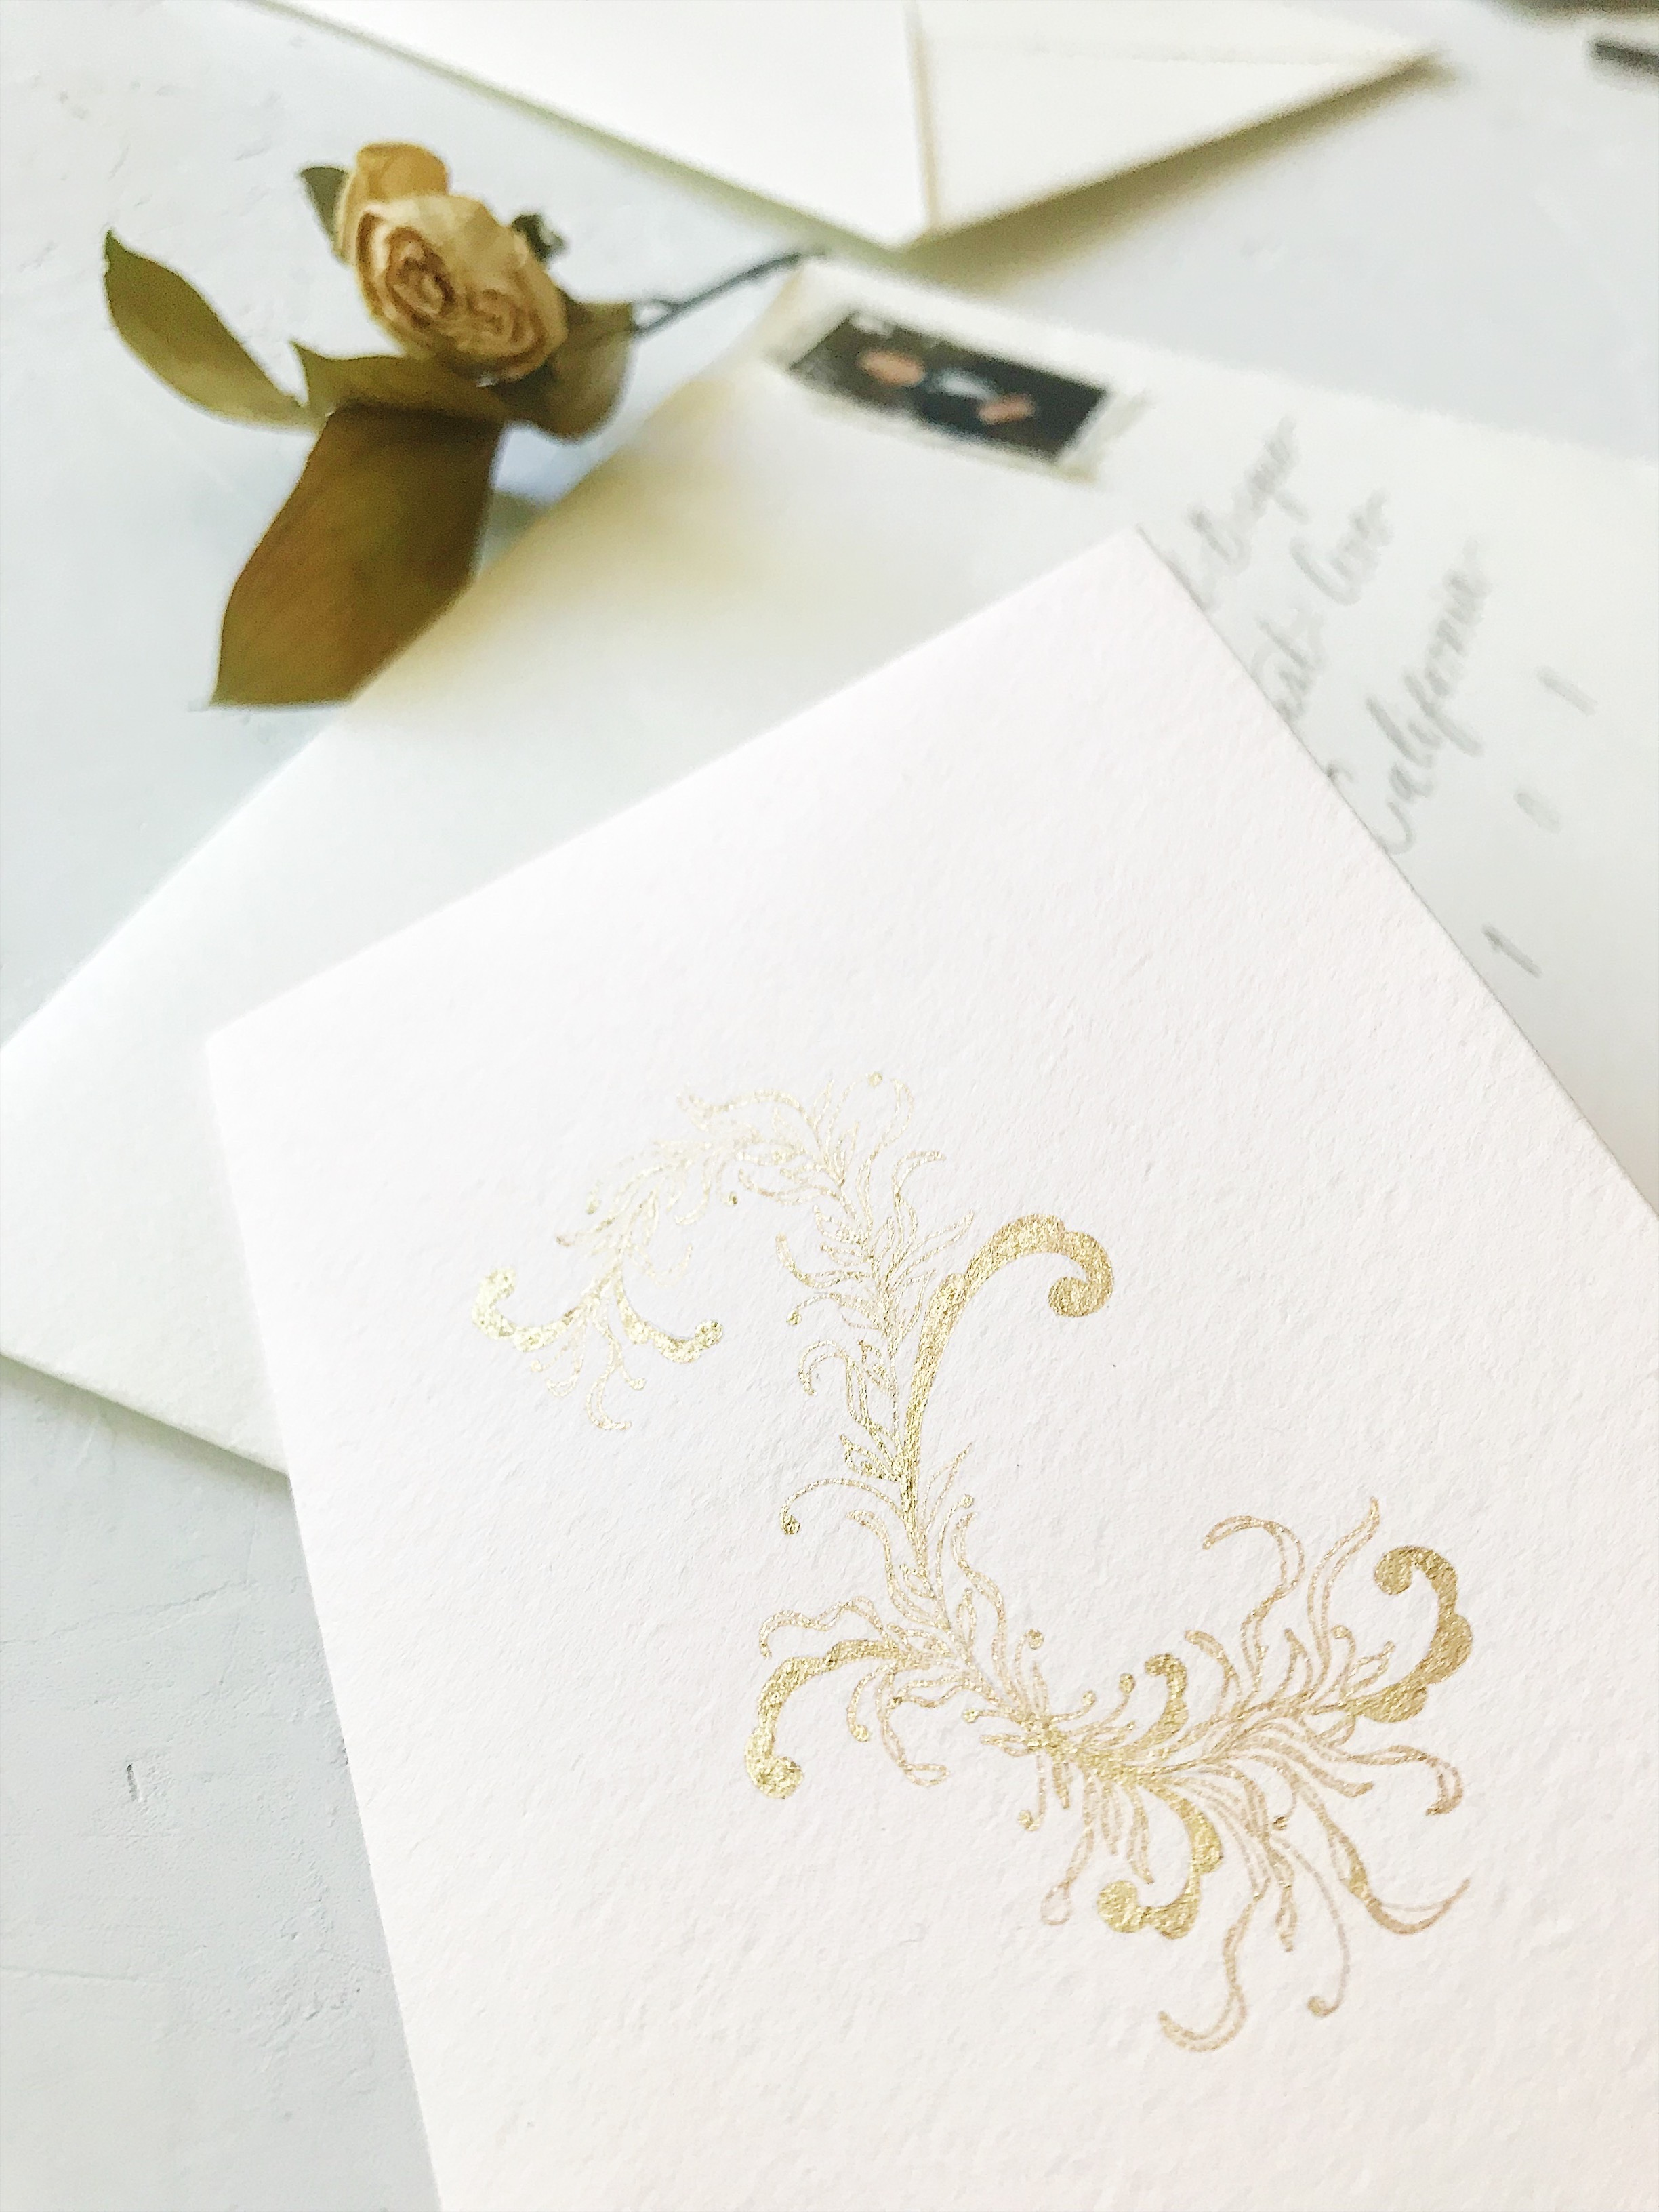 Bespoke Wedding Calligraphy Invitation Suite - Esperanza Atelier Fine Art Calligraphy.